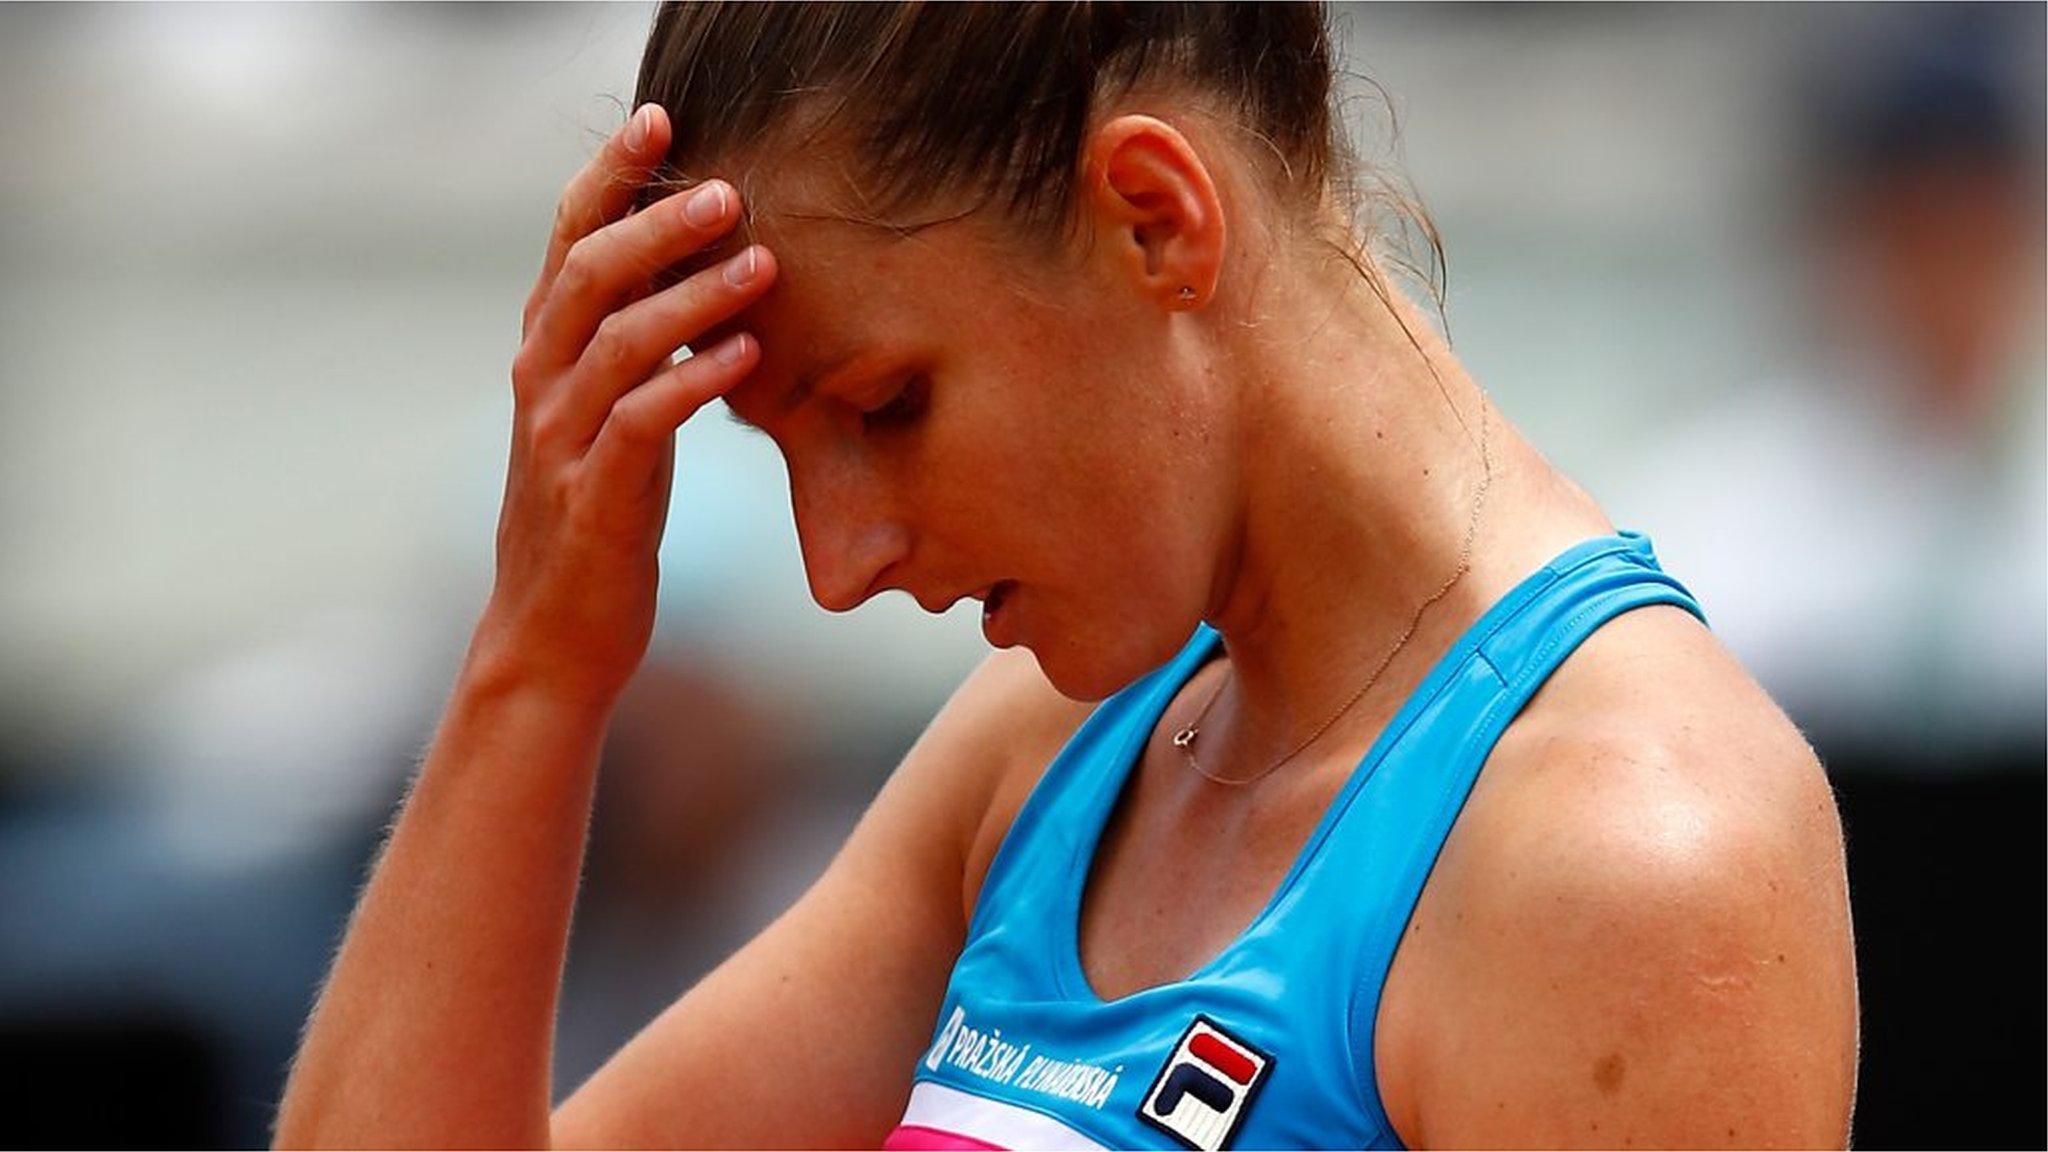 Italian Open: Karolina Pliskova attacks umpire's chair after defeat